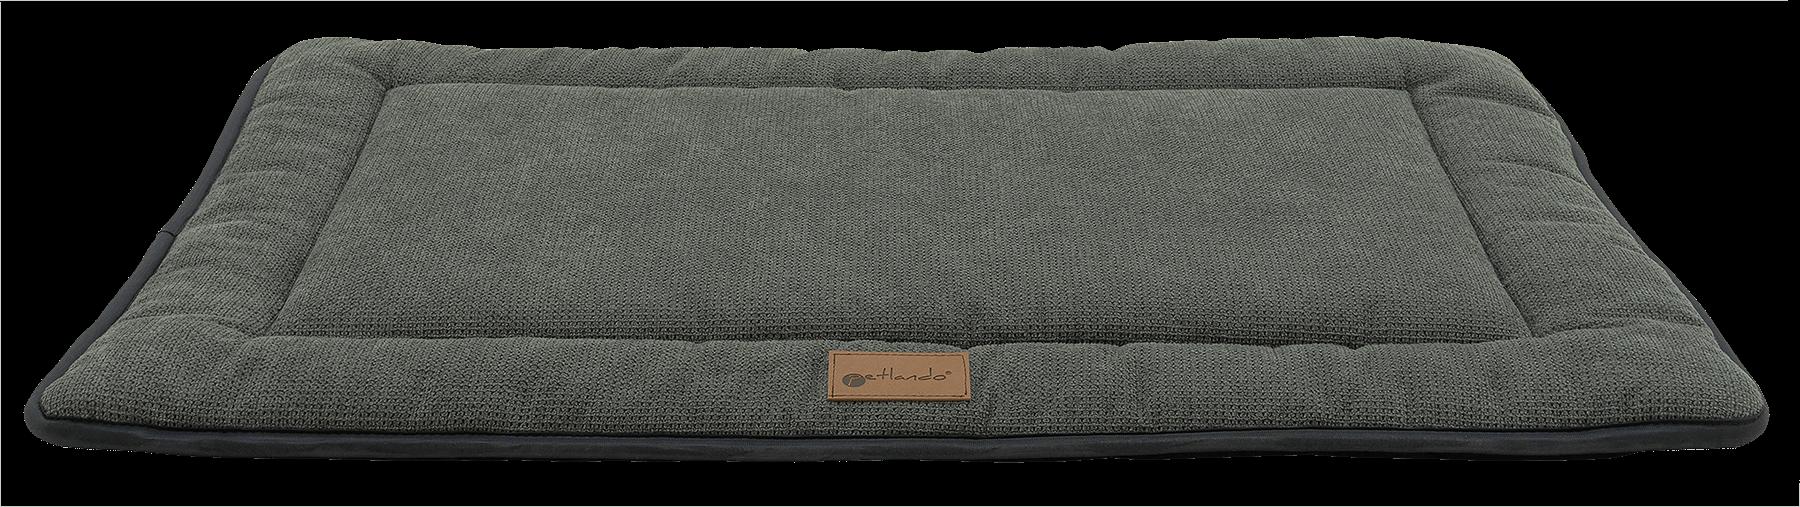 Relaxmat 50x30x5.5cm  -XS- Grey